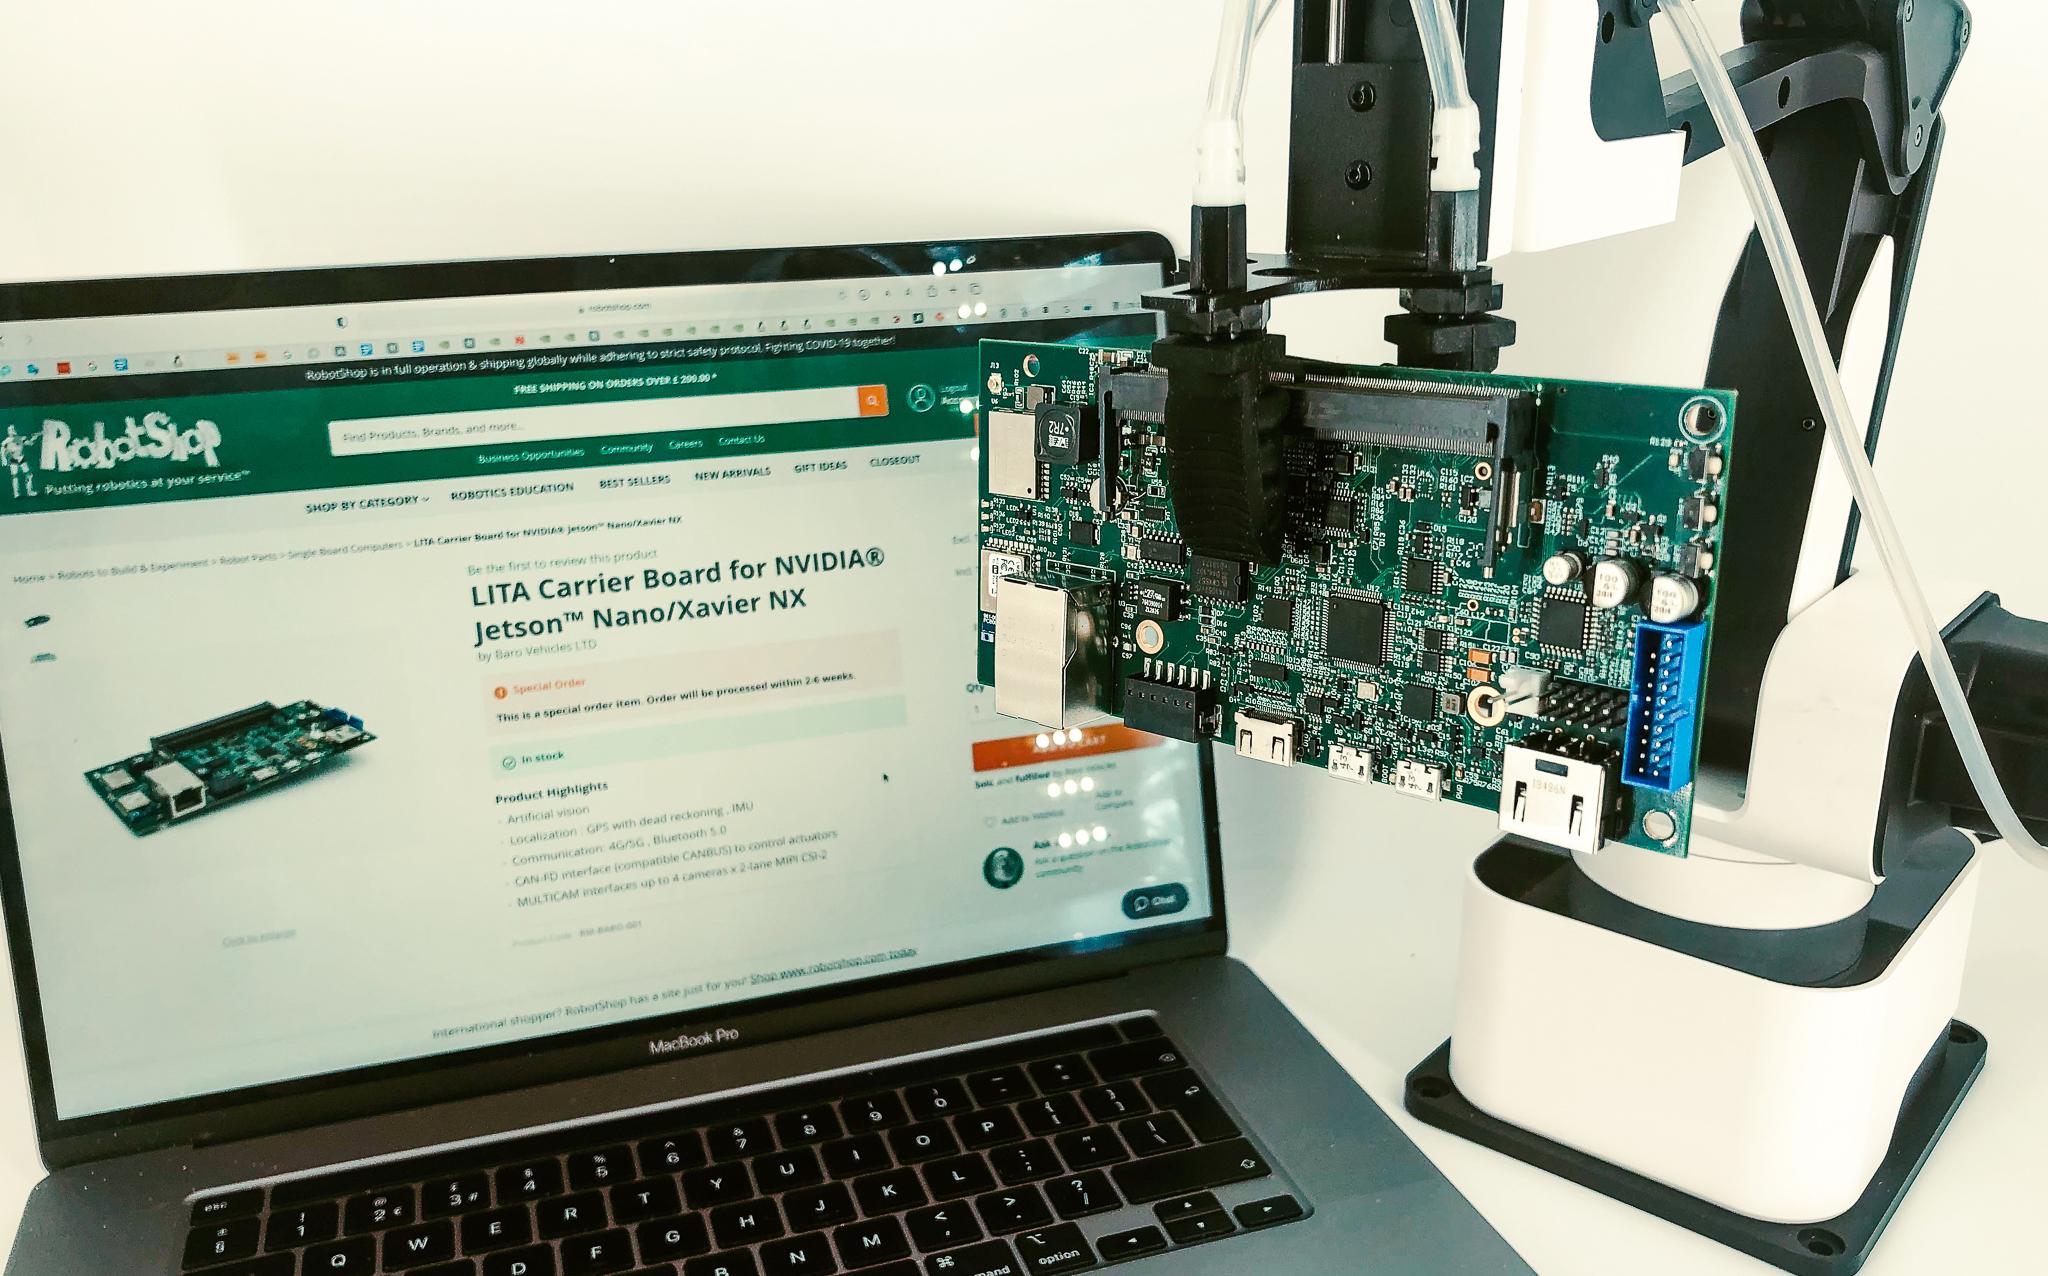 LITA Carrier Board for NVIDIA Jetson